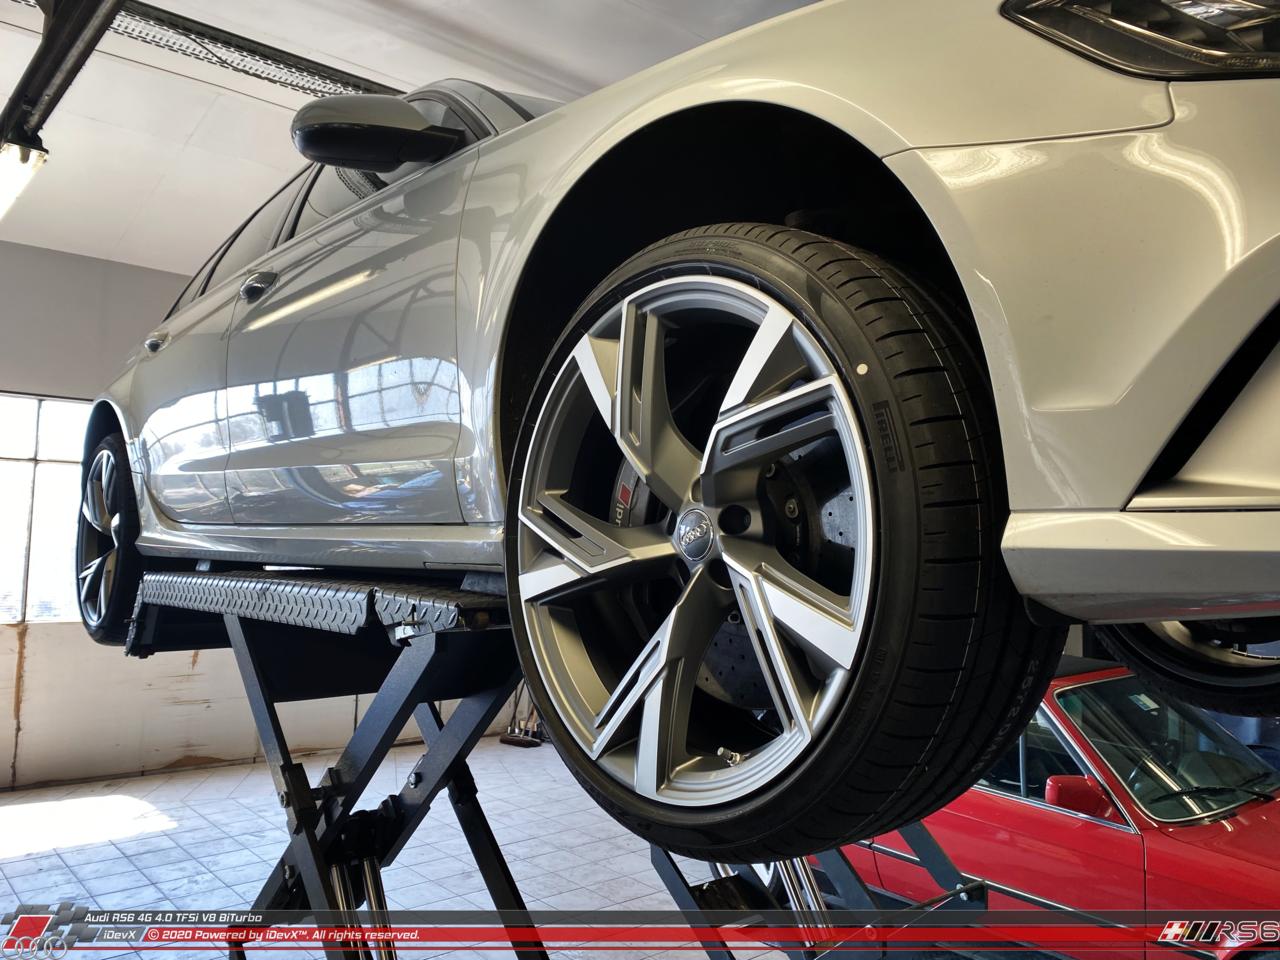 18.03.2020_Audi-RS6_iDevX_003.png